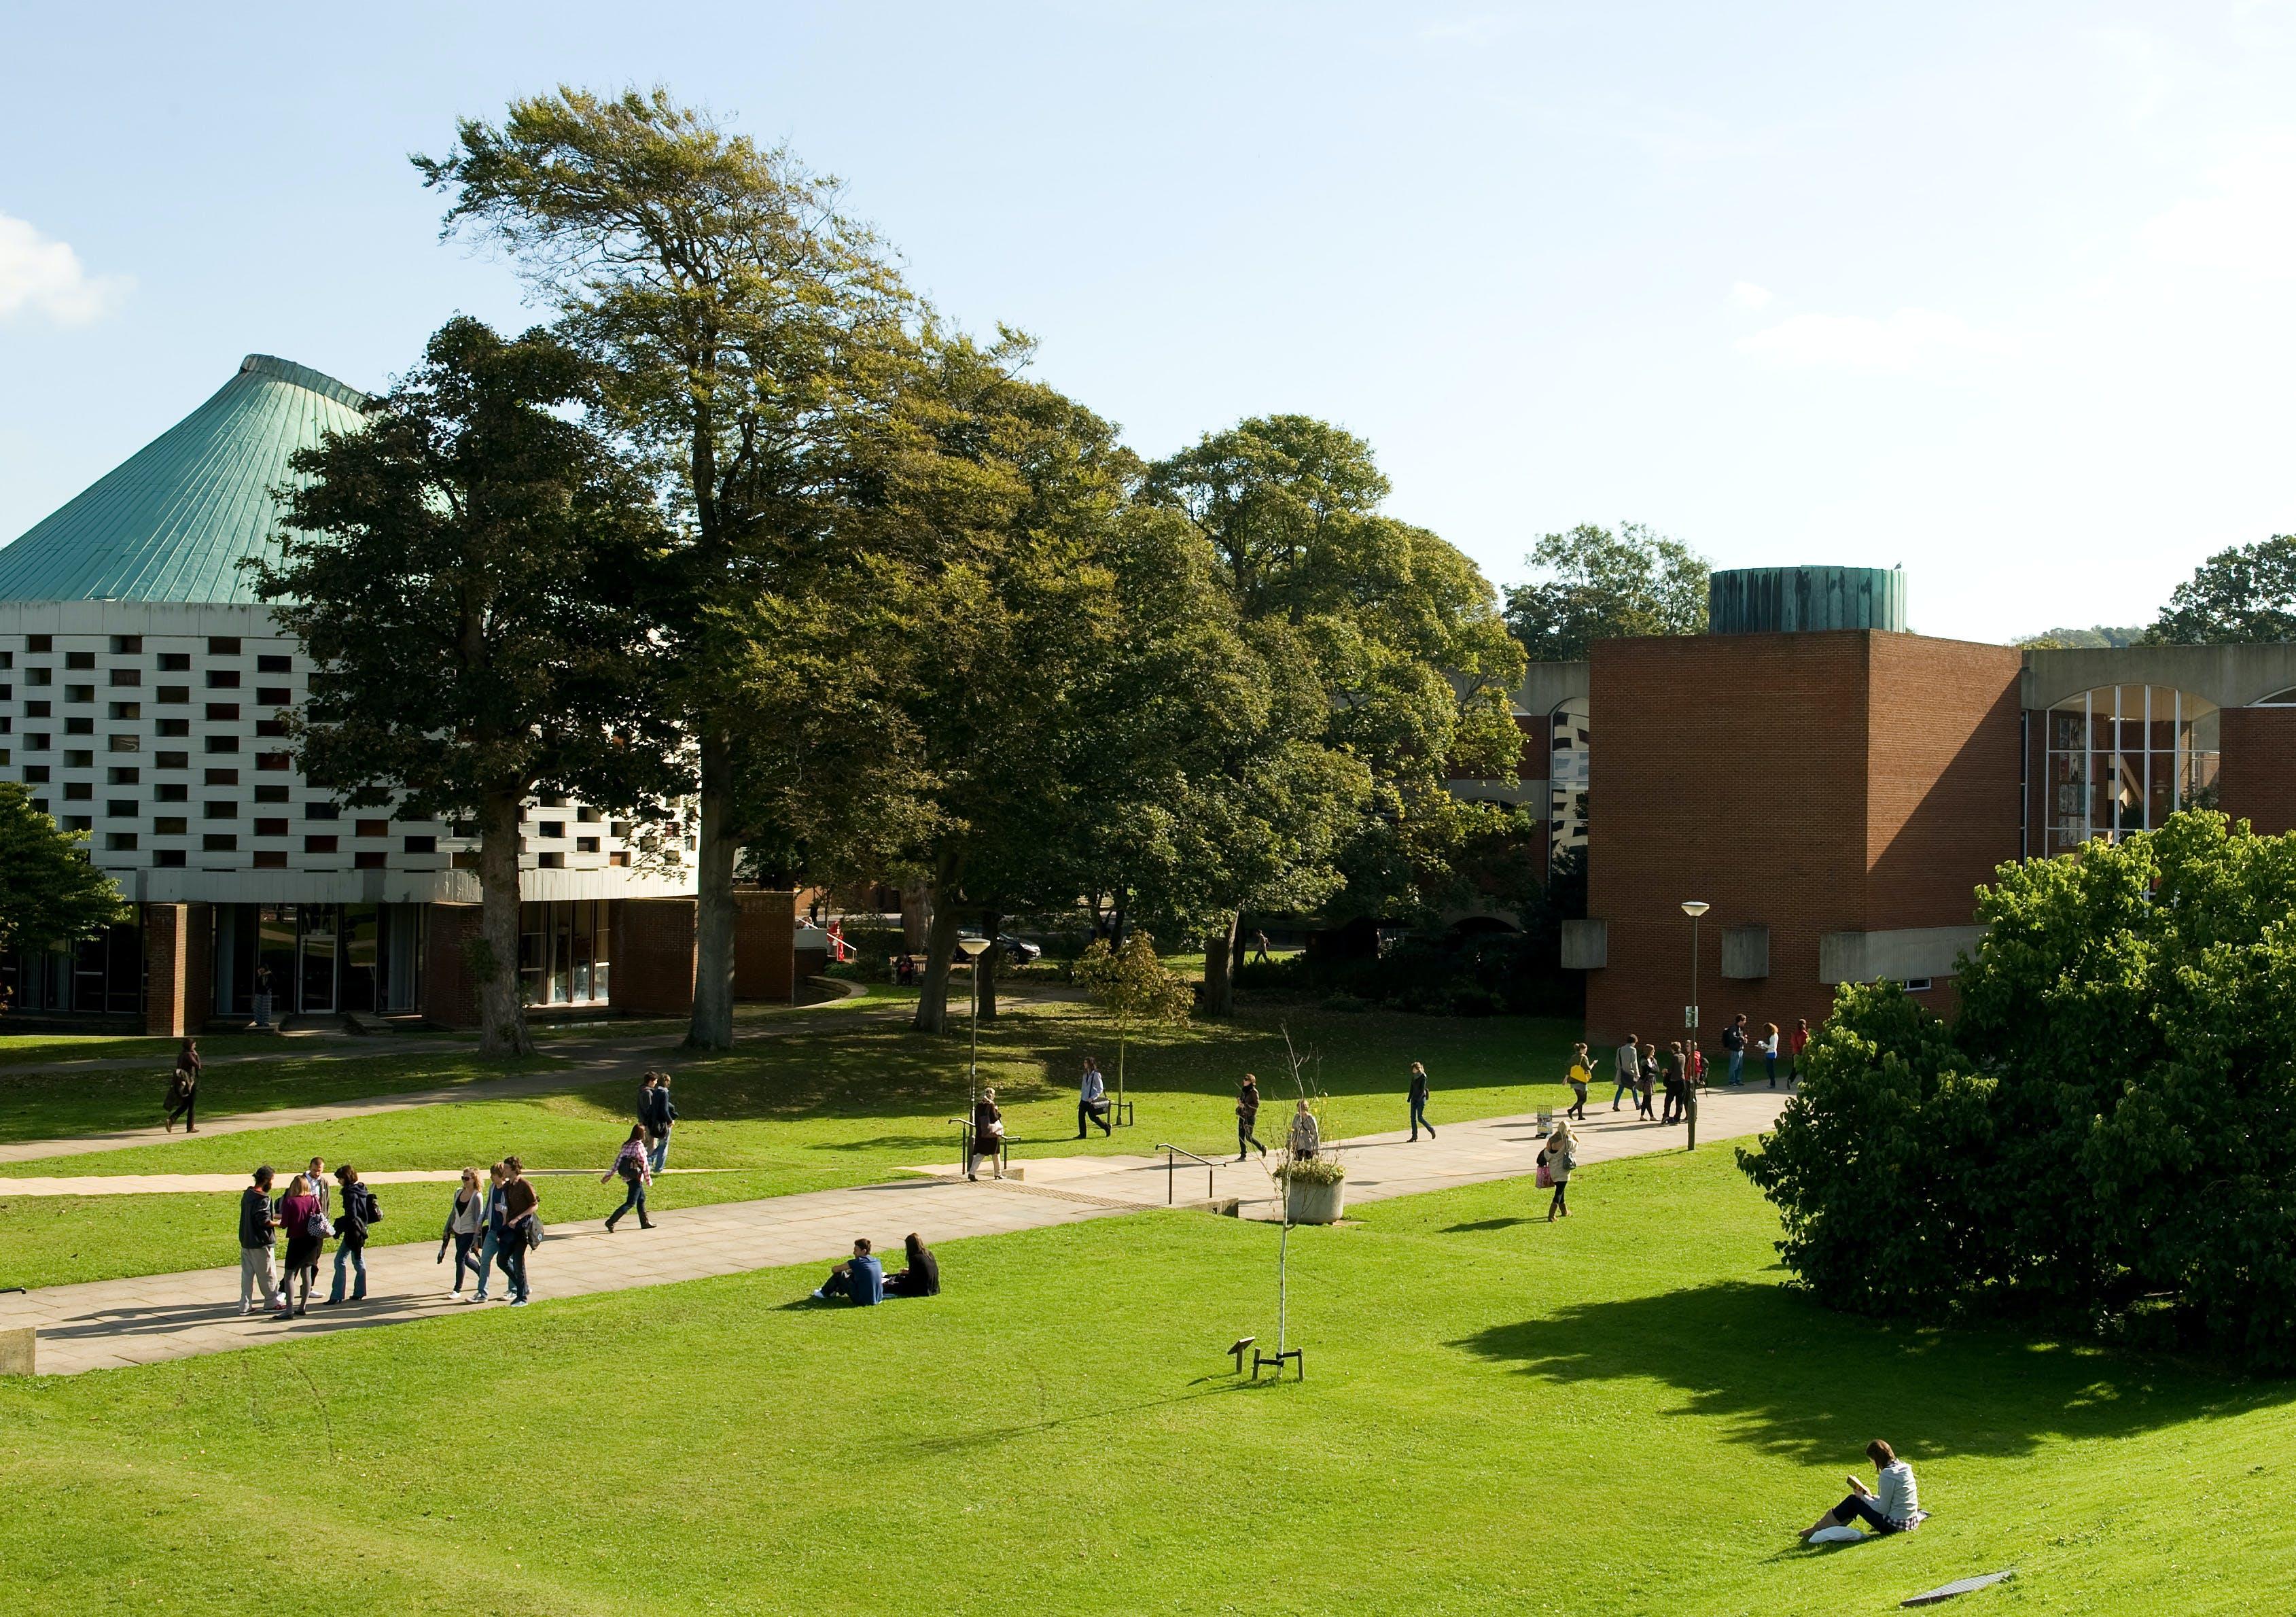 University of Sussex - Brighton - United Kingdom